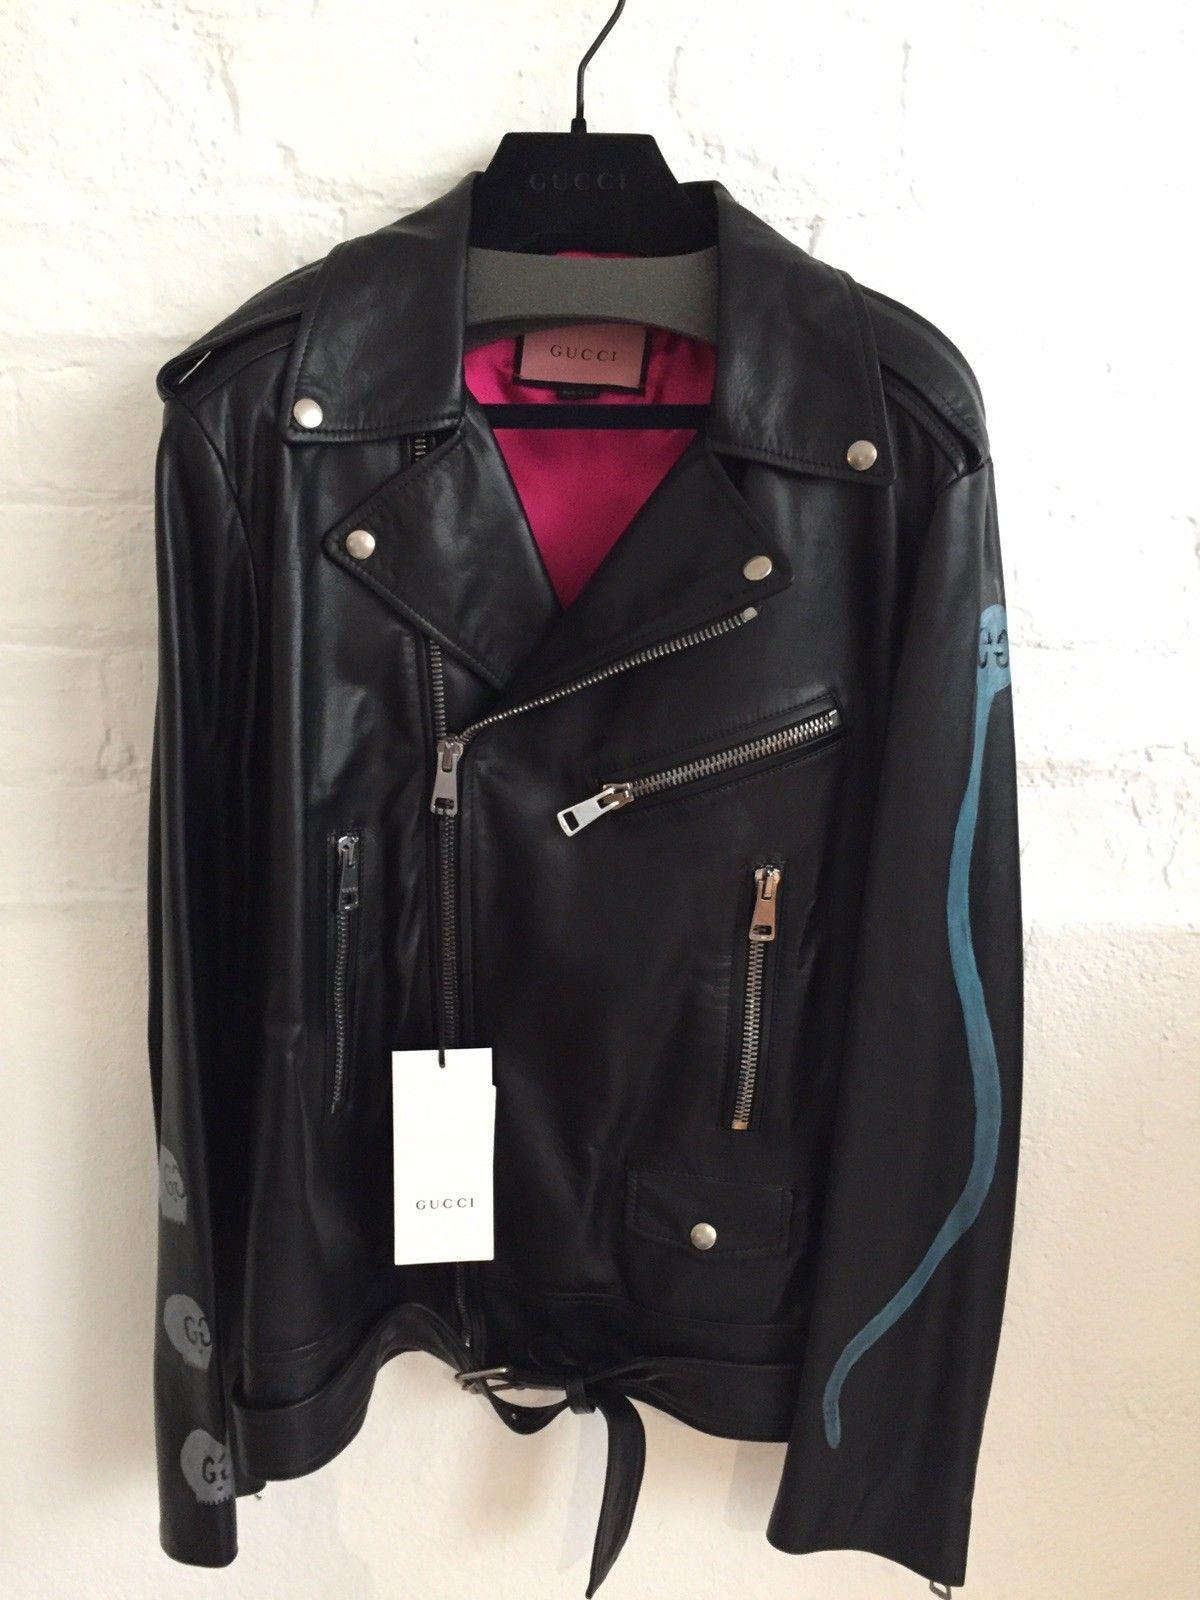 Gucci womens black leather biker jacket ss18 size uk10 £